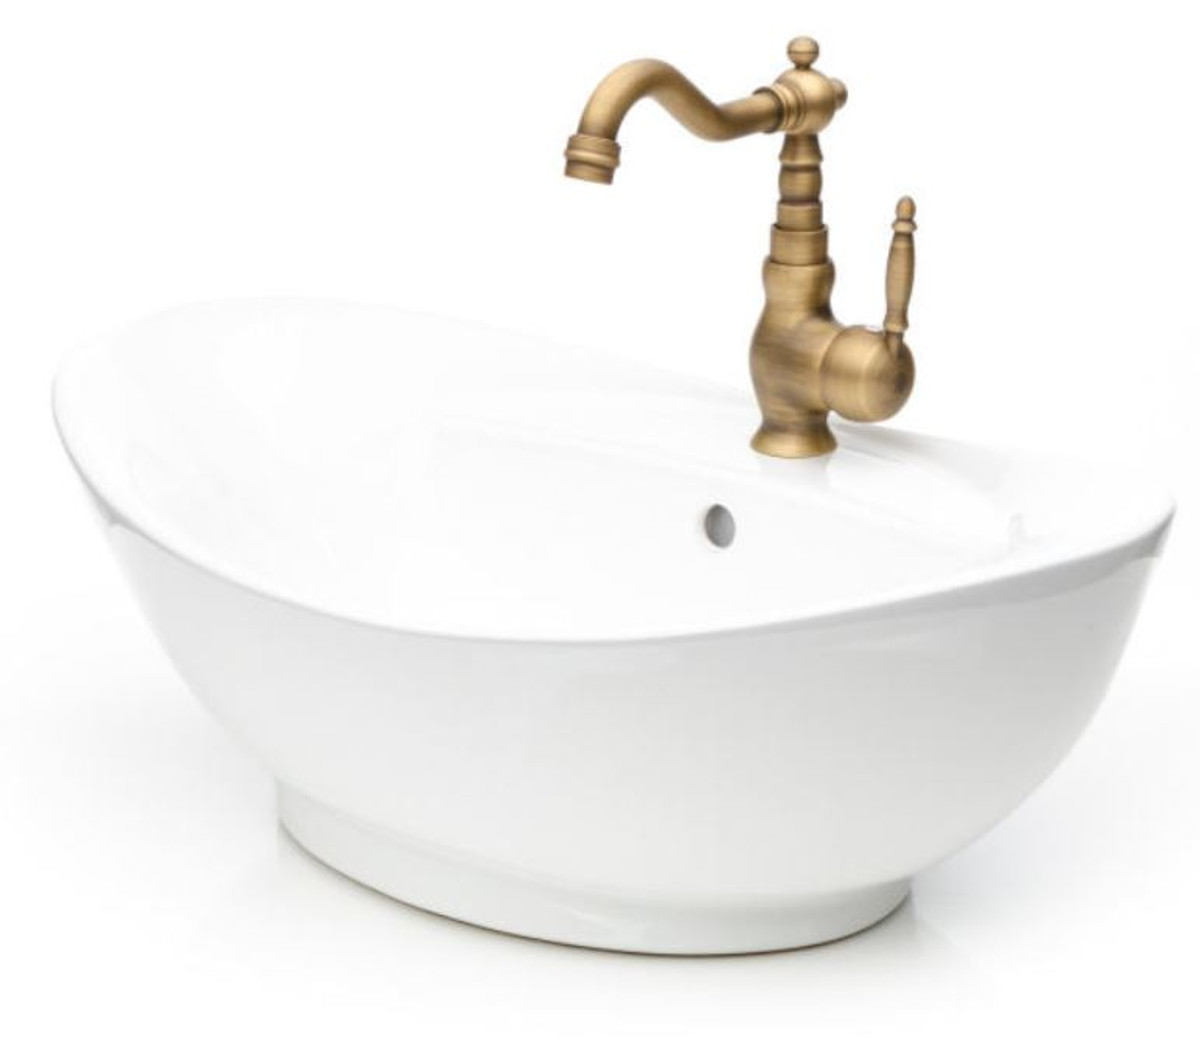 casa padrino art nouveau washbasin set white antique bronze 58 5 x 38 5 x h 43 5 cm retro single lever faucet with elegant washbasin rustic